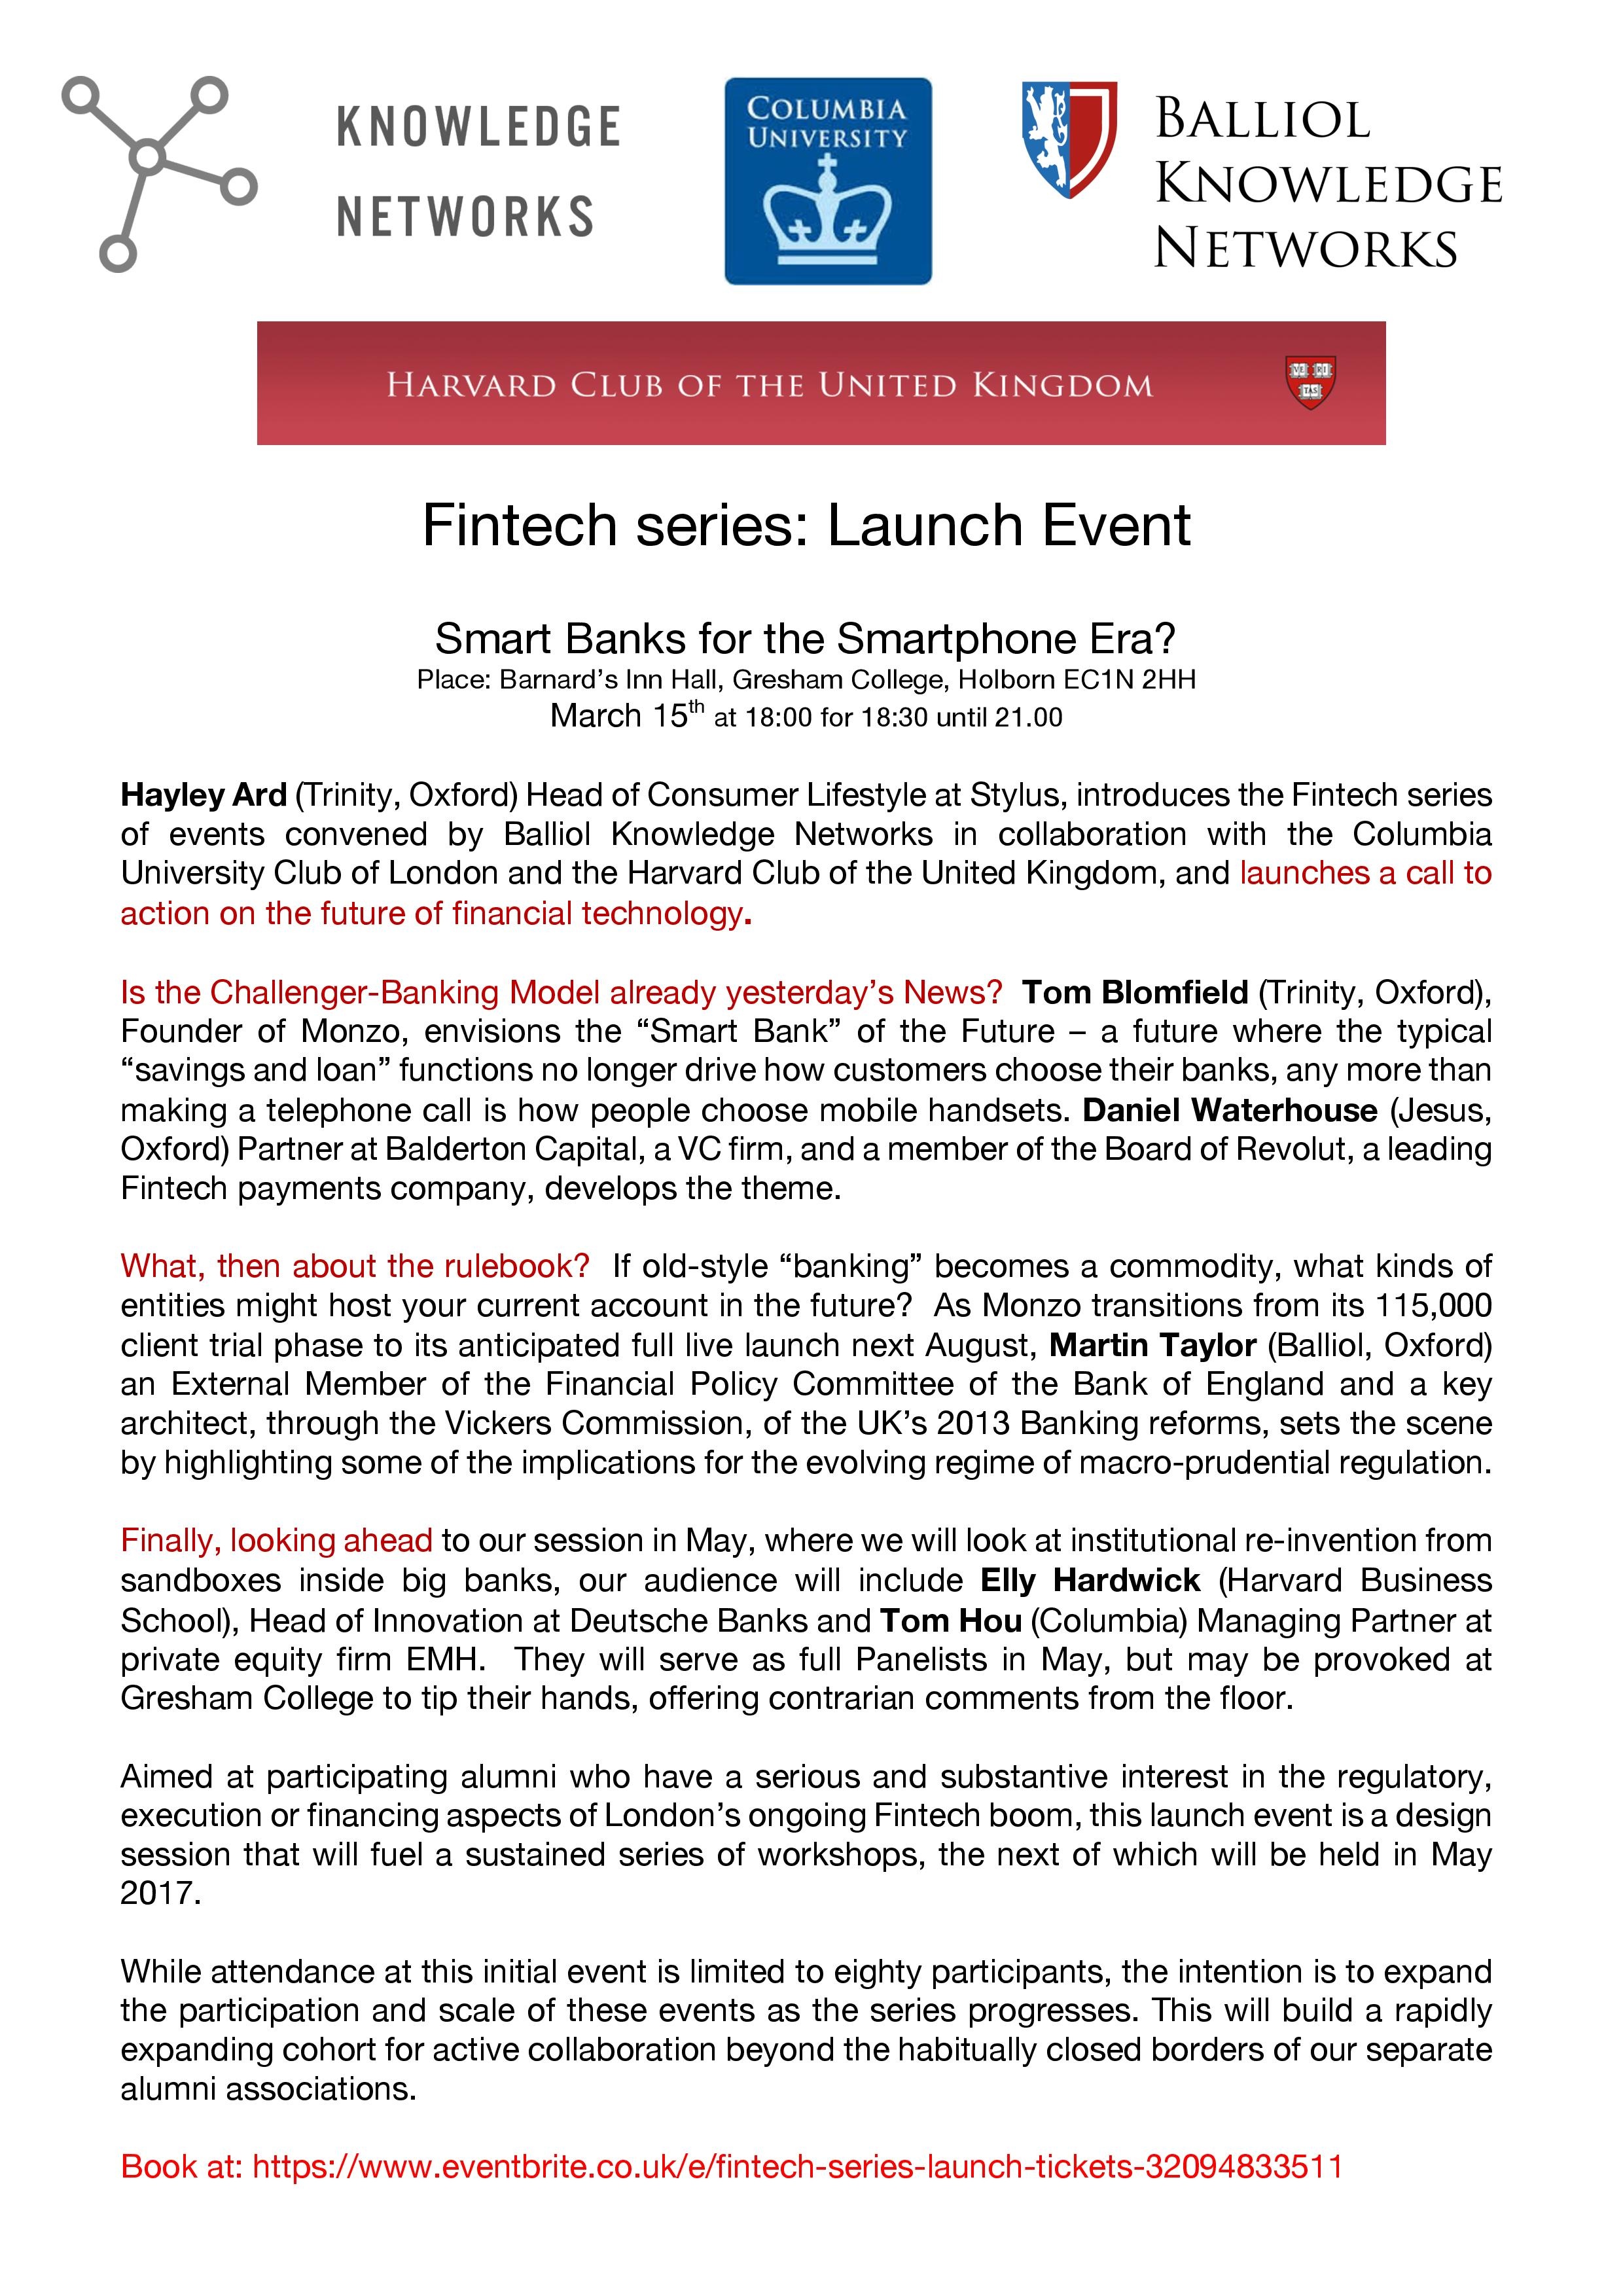 fintech-event-page-001